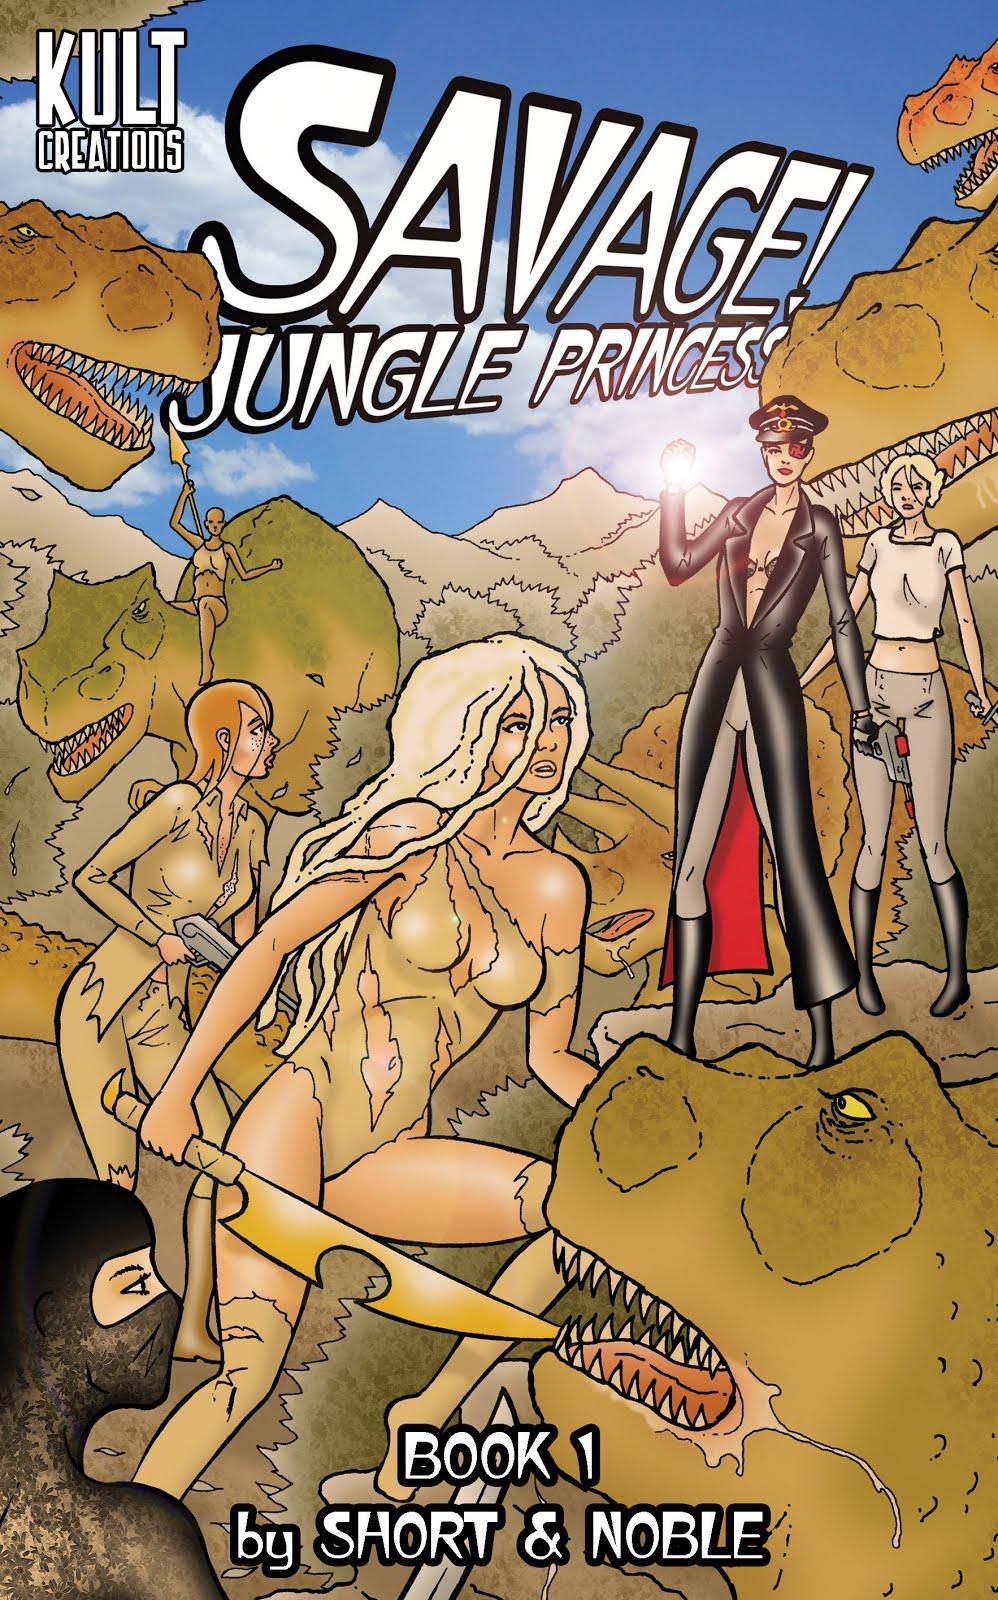 Buy 'Savage! Jungle Princess' Book 1 Digital Version BELOW!